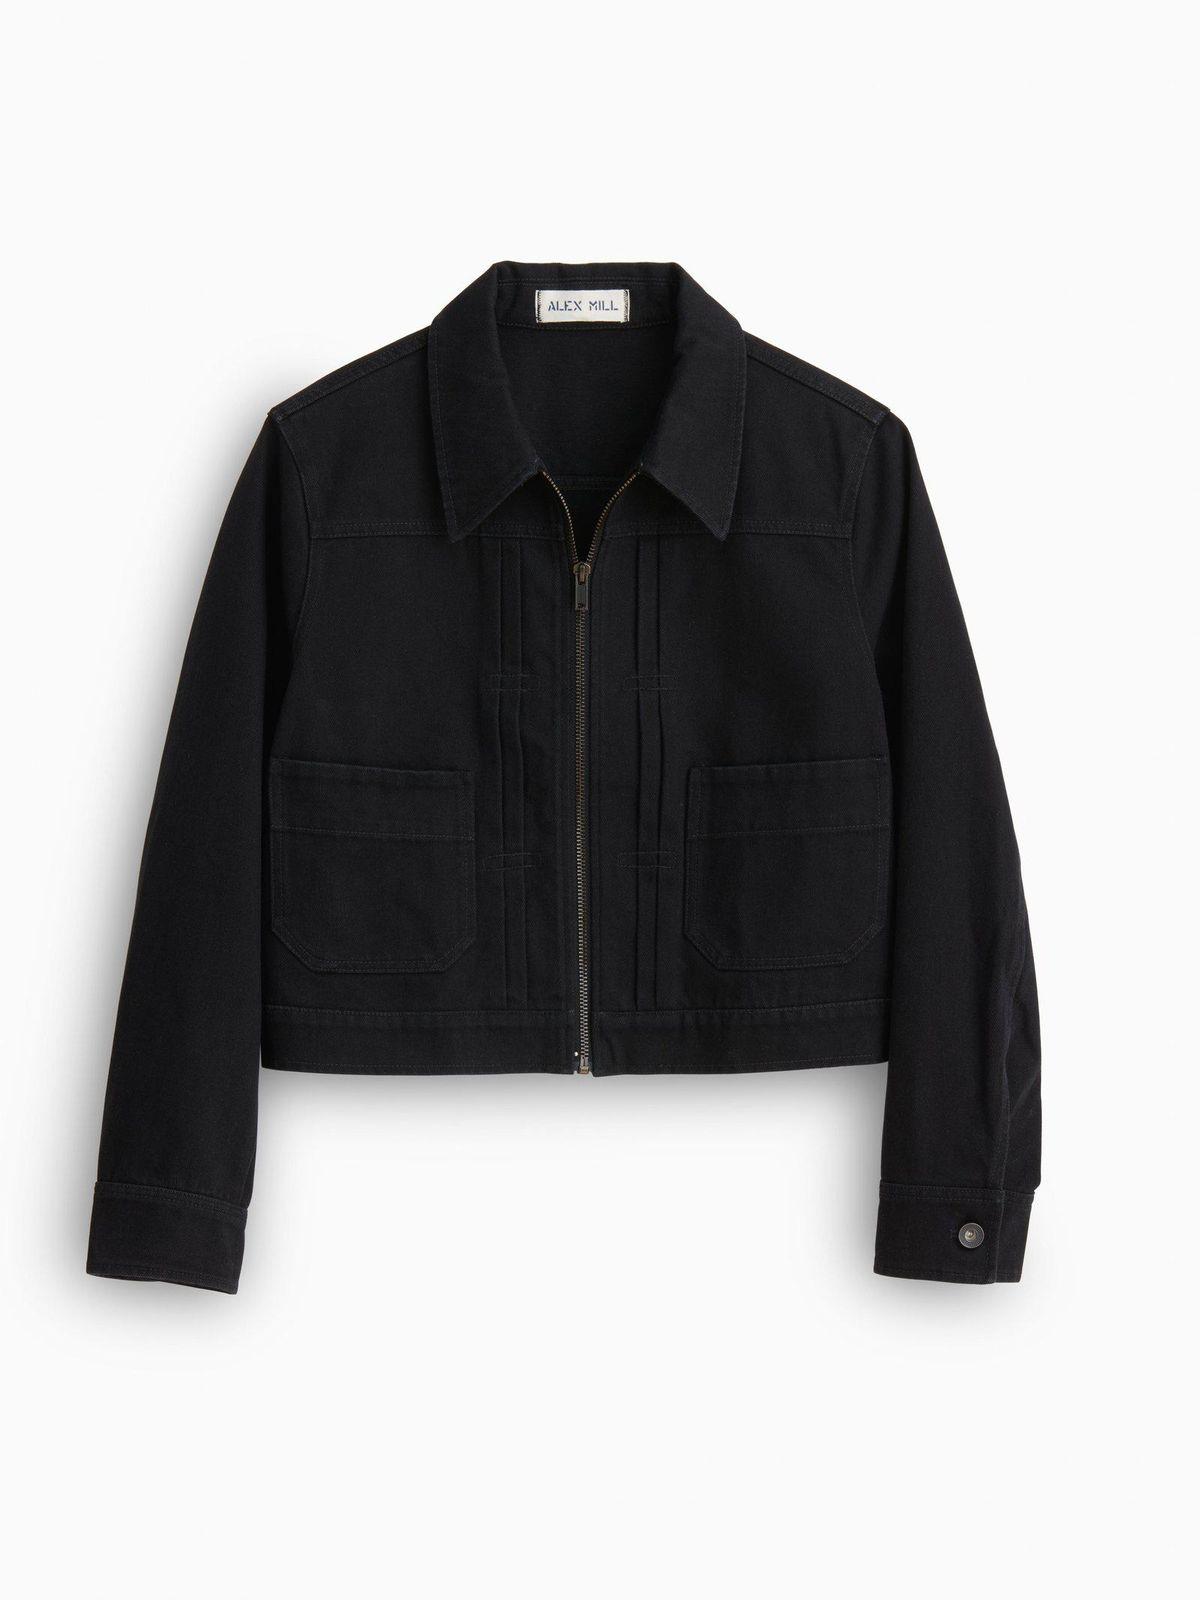 alex mill shrunken zip jacket in recycled denim